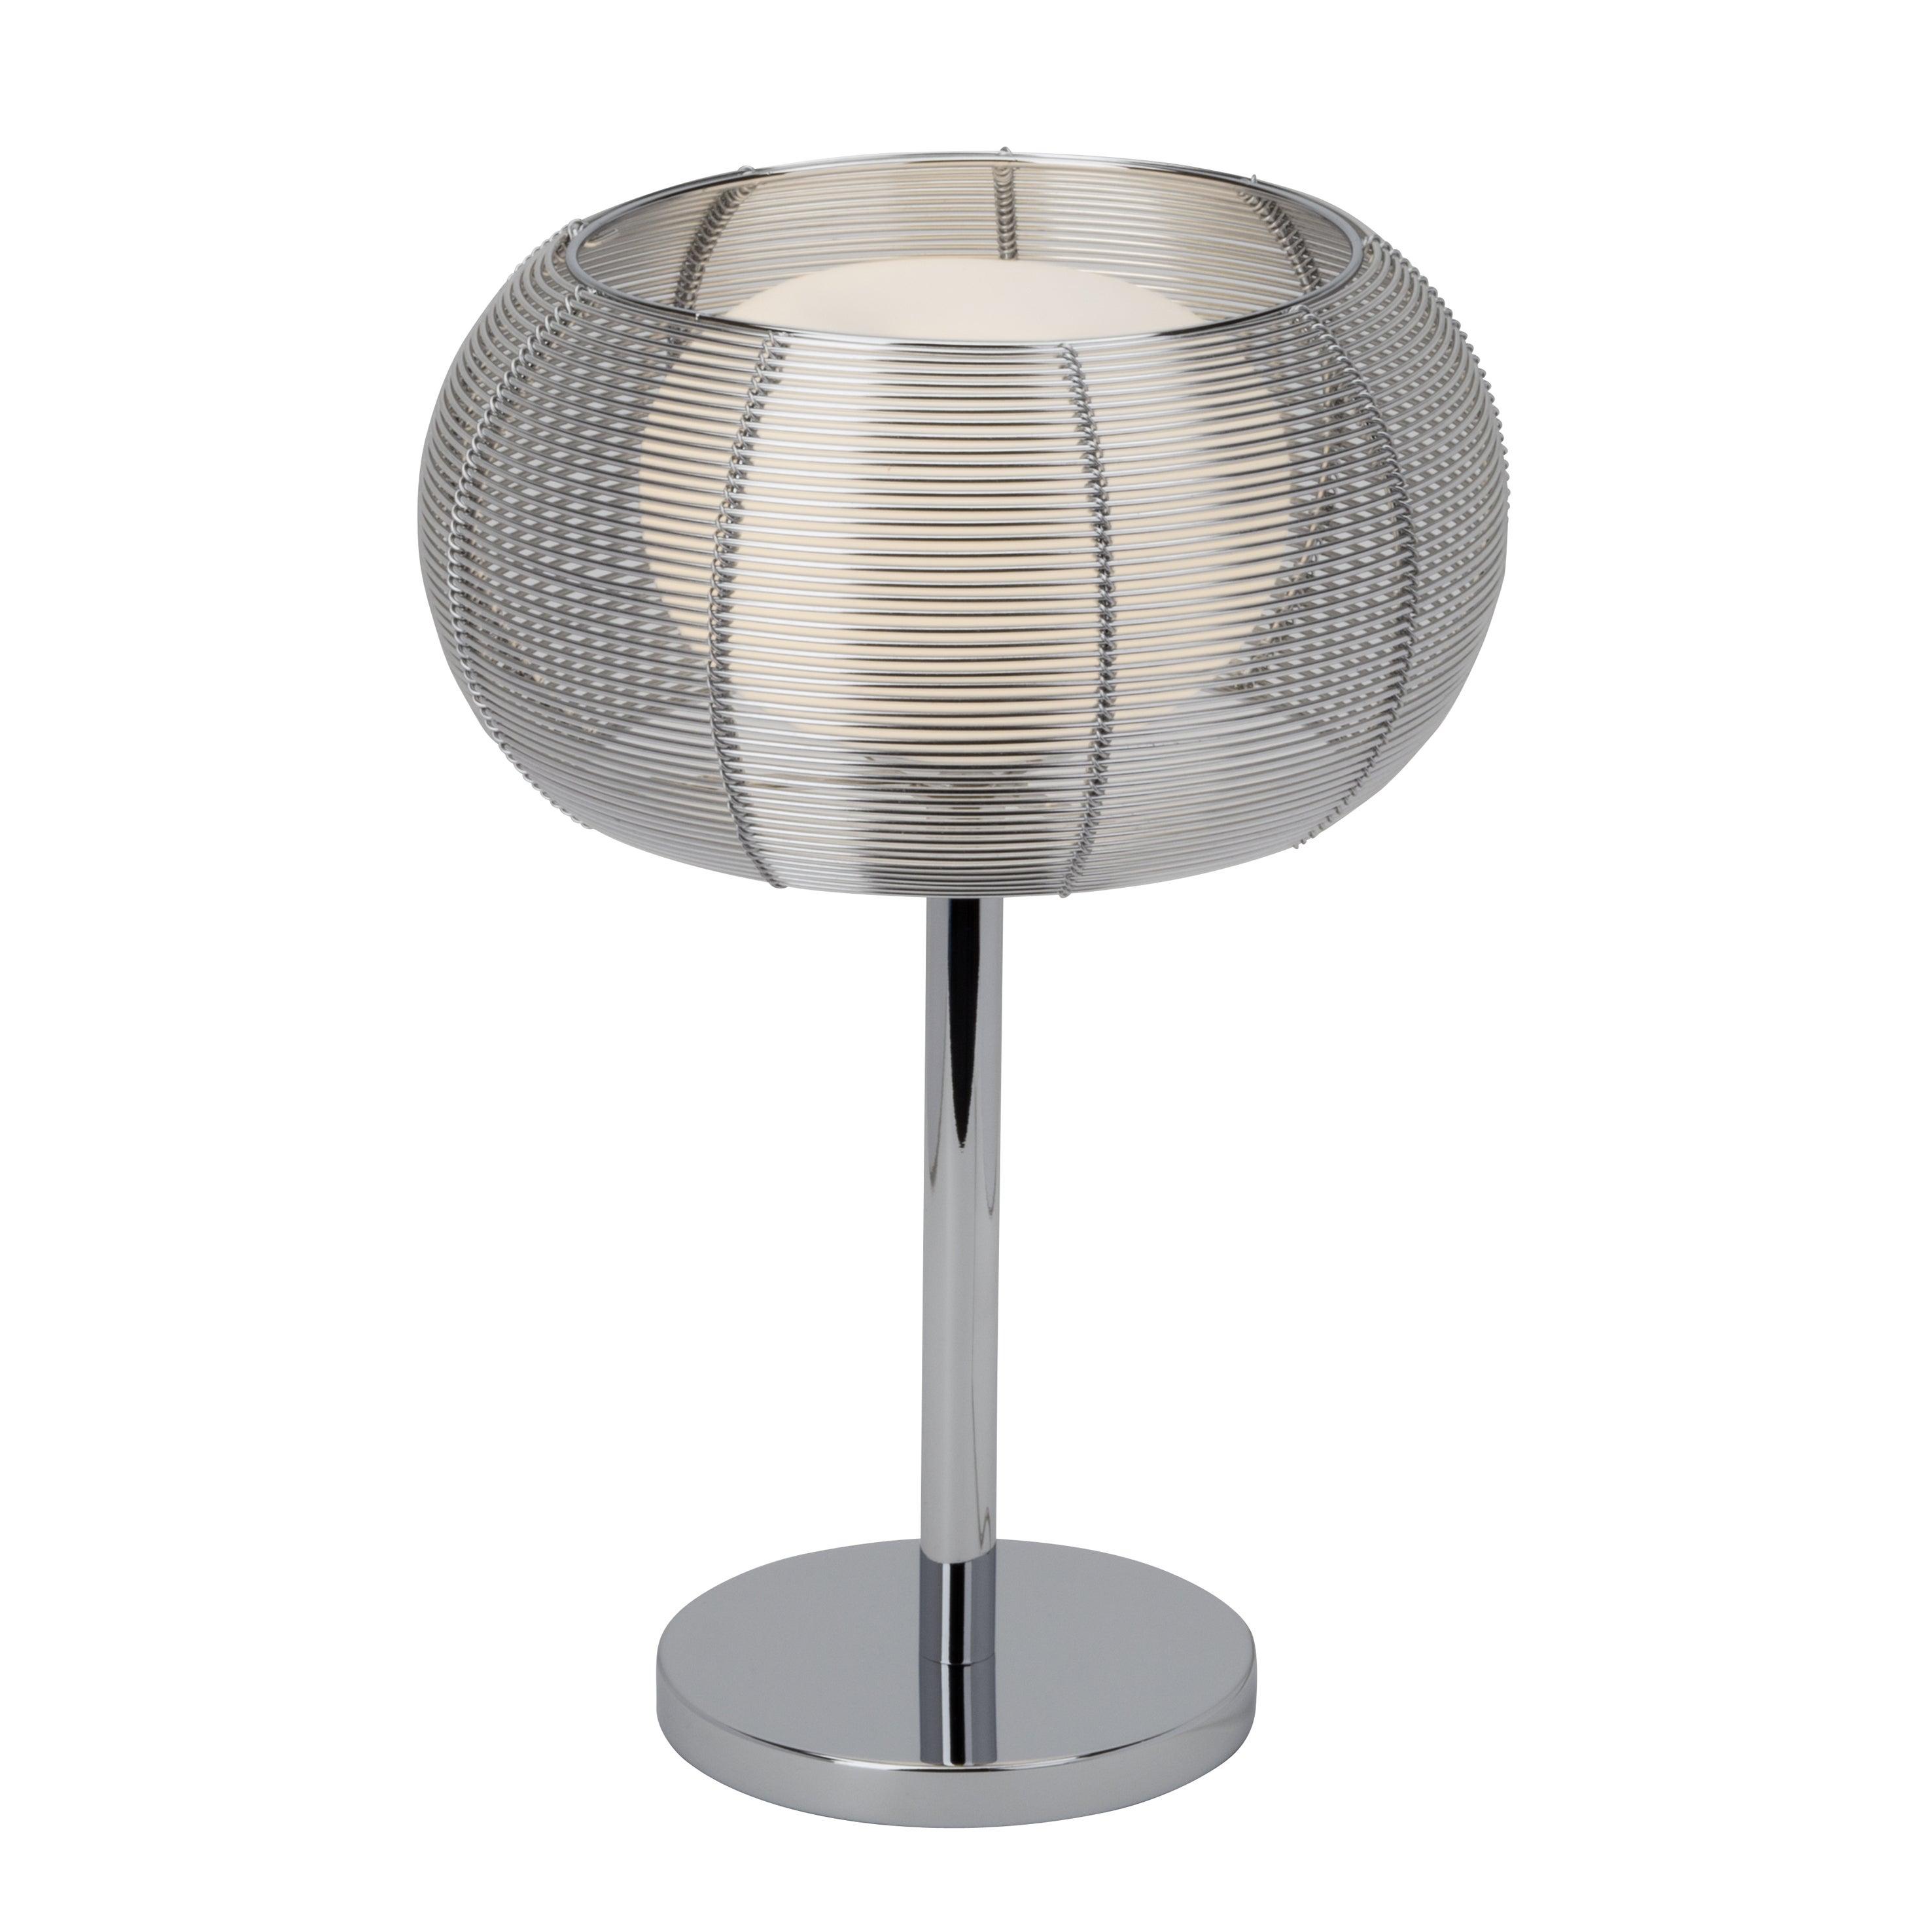 Lampe métal bronzechrome, BRILLIANT Relax